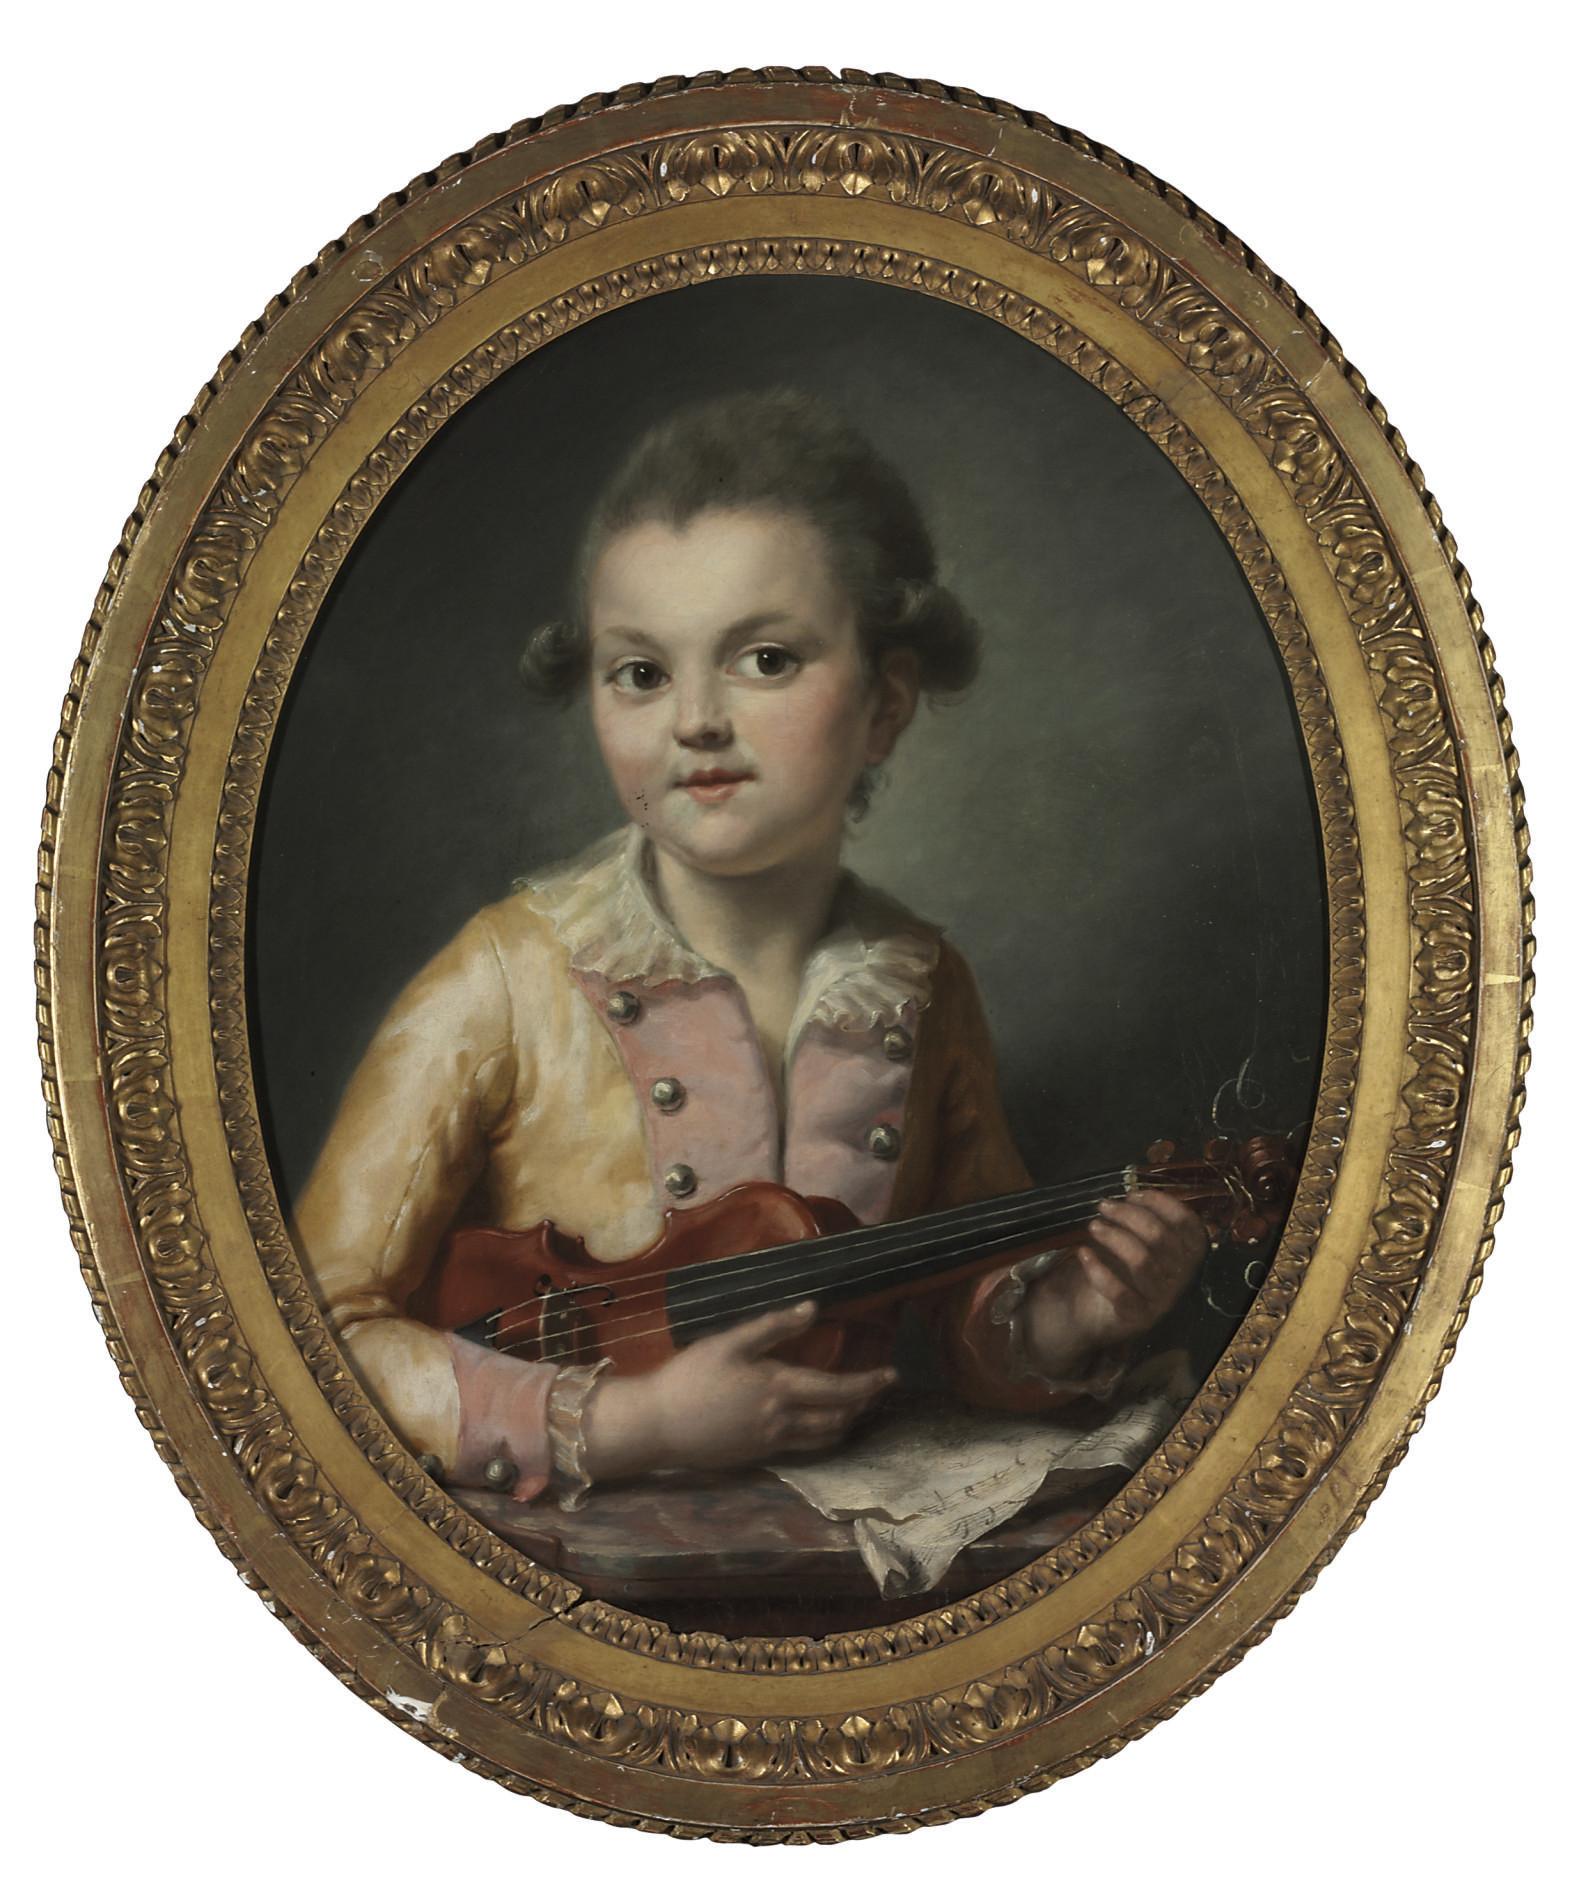 Portrait of François-Constance Guérin as a boy, half-length, plucking a violin